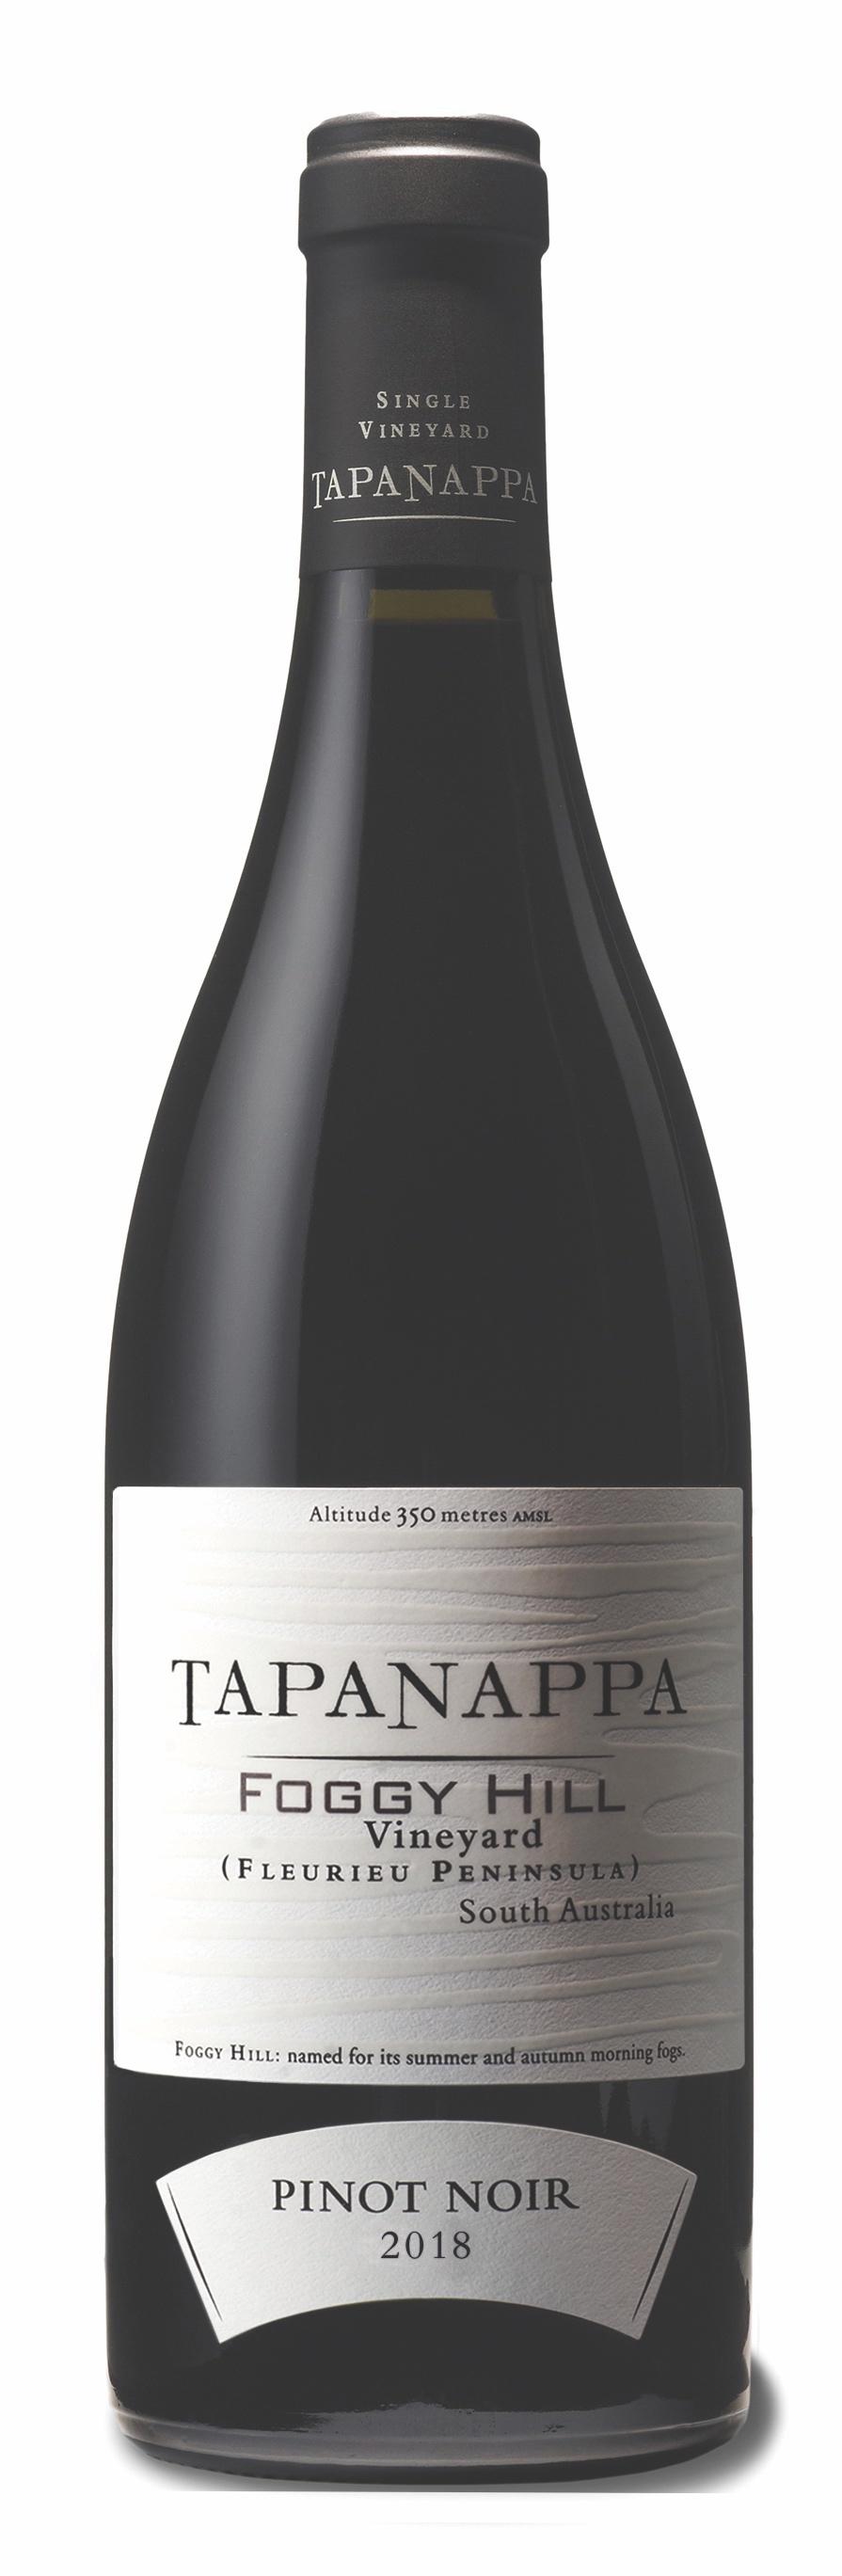 Tapanappa Foggy Hill Vineyard 2018 Pinot Noir bottleshot